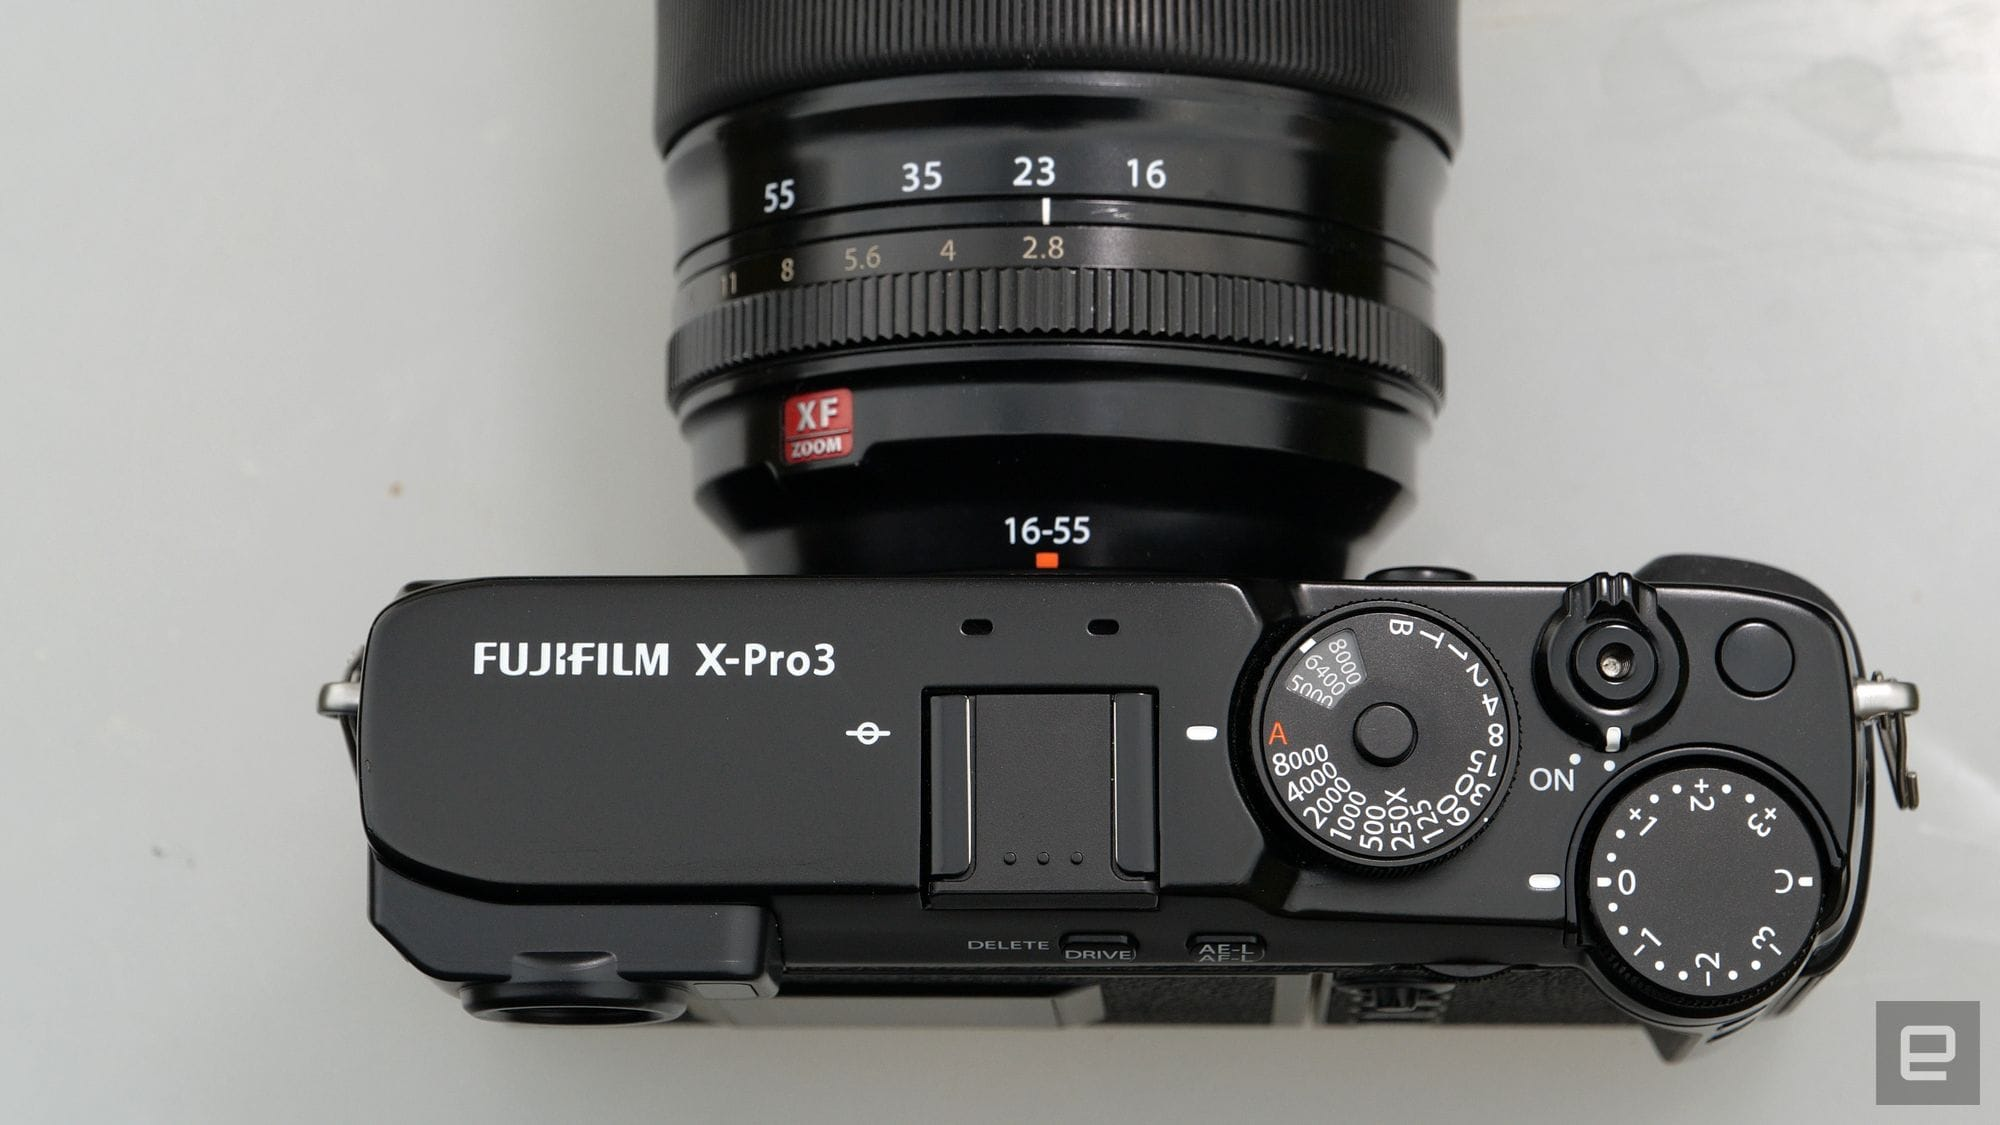 Fujifilm X-Pro3 mirrorless camera